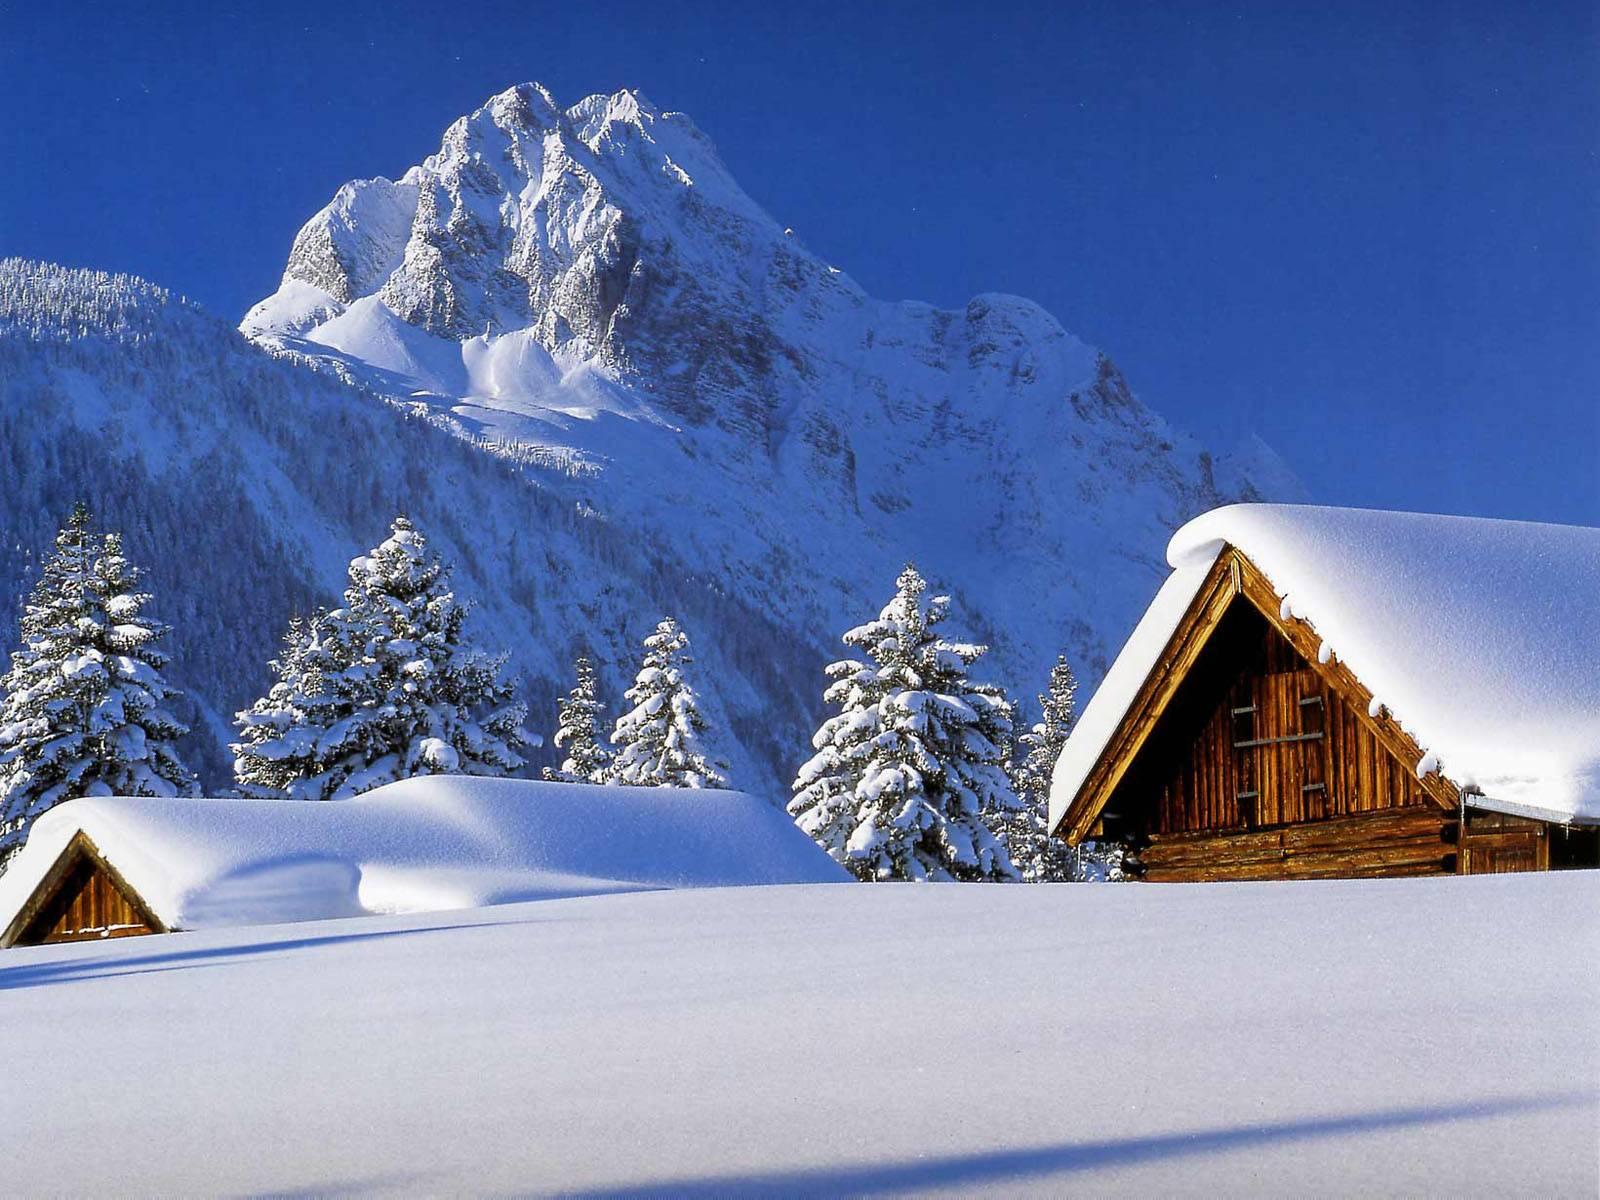 hd desktop free 2012 winter scenes nature beautiful wallpaper hd 1600x1200